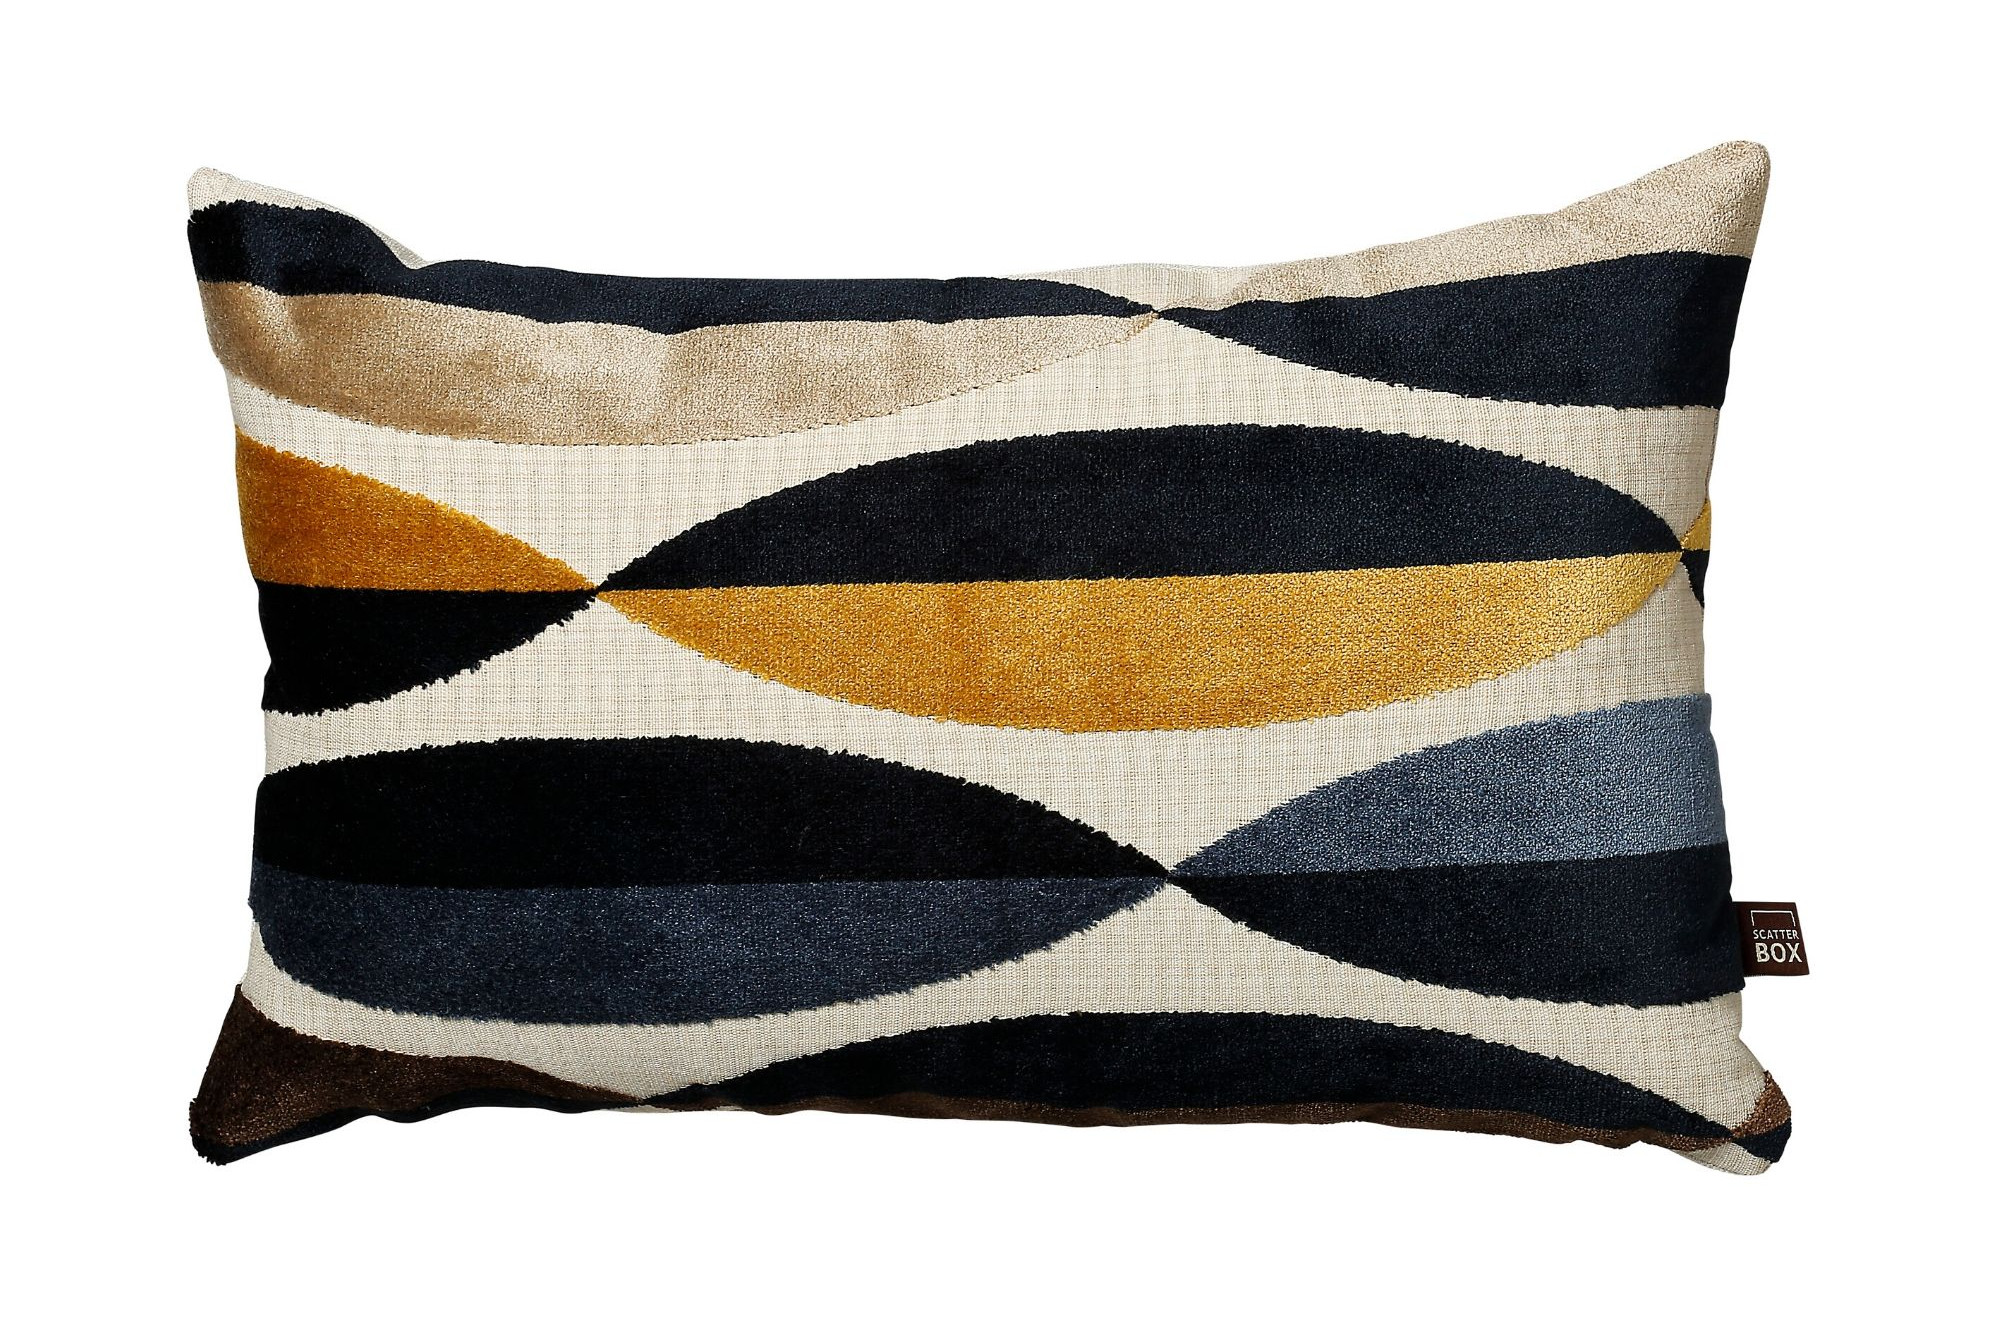 Mustard Yellow and Blue Eclipse Pattern Rectangular Cushion